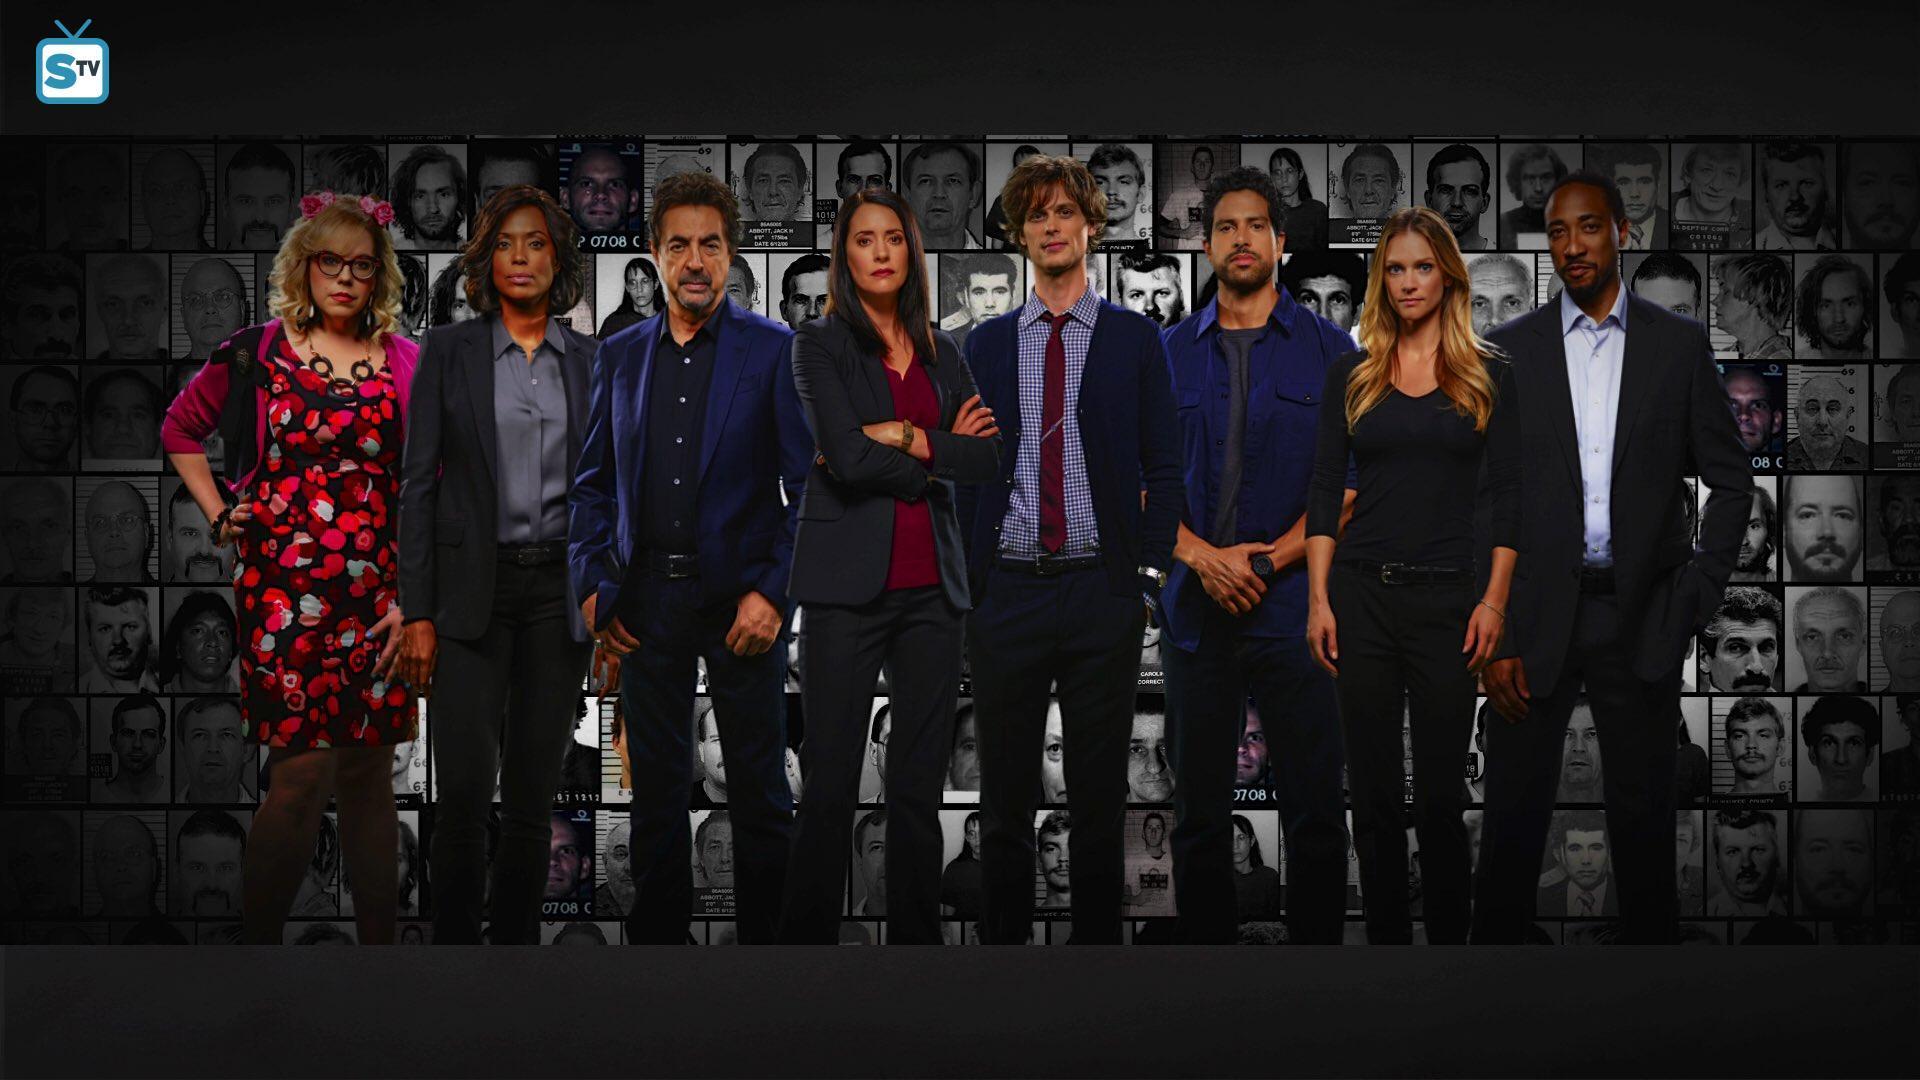 Criminal Minds Wallpapers - Top Free Criminal Minds ...